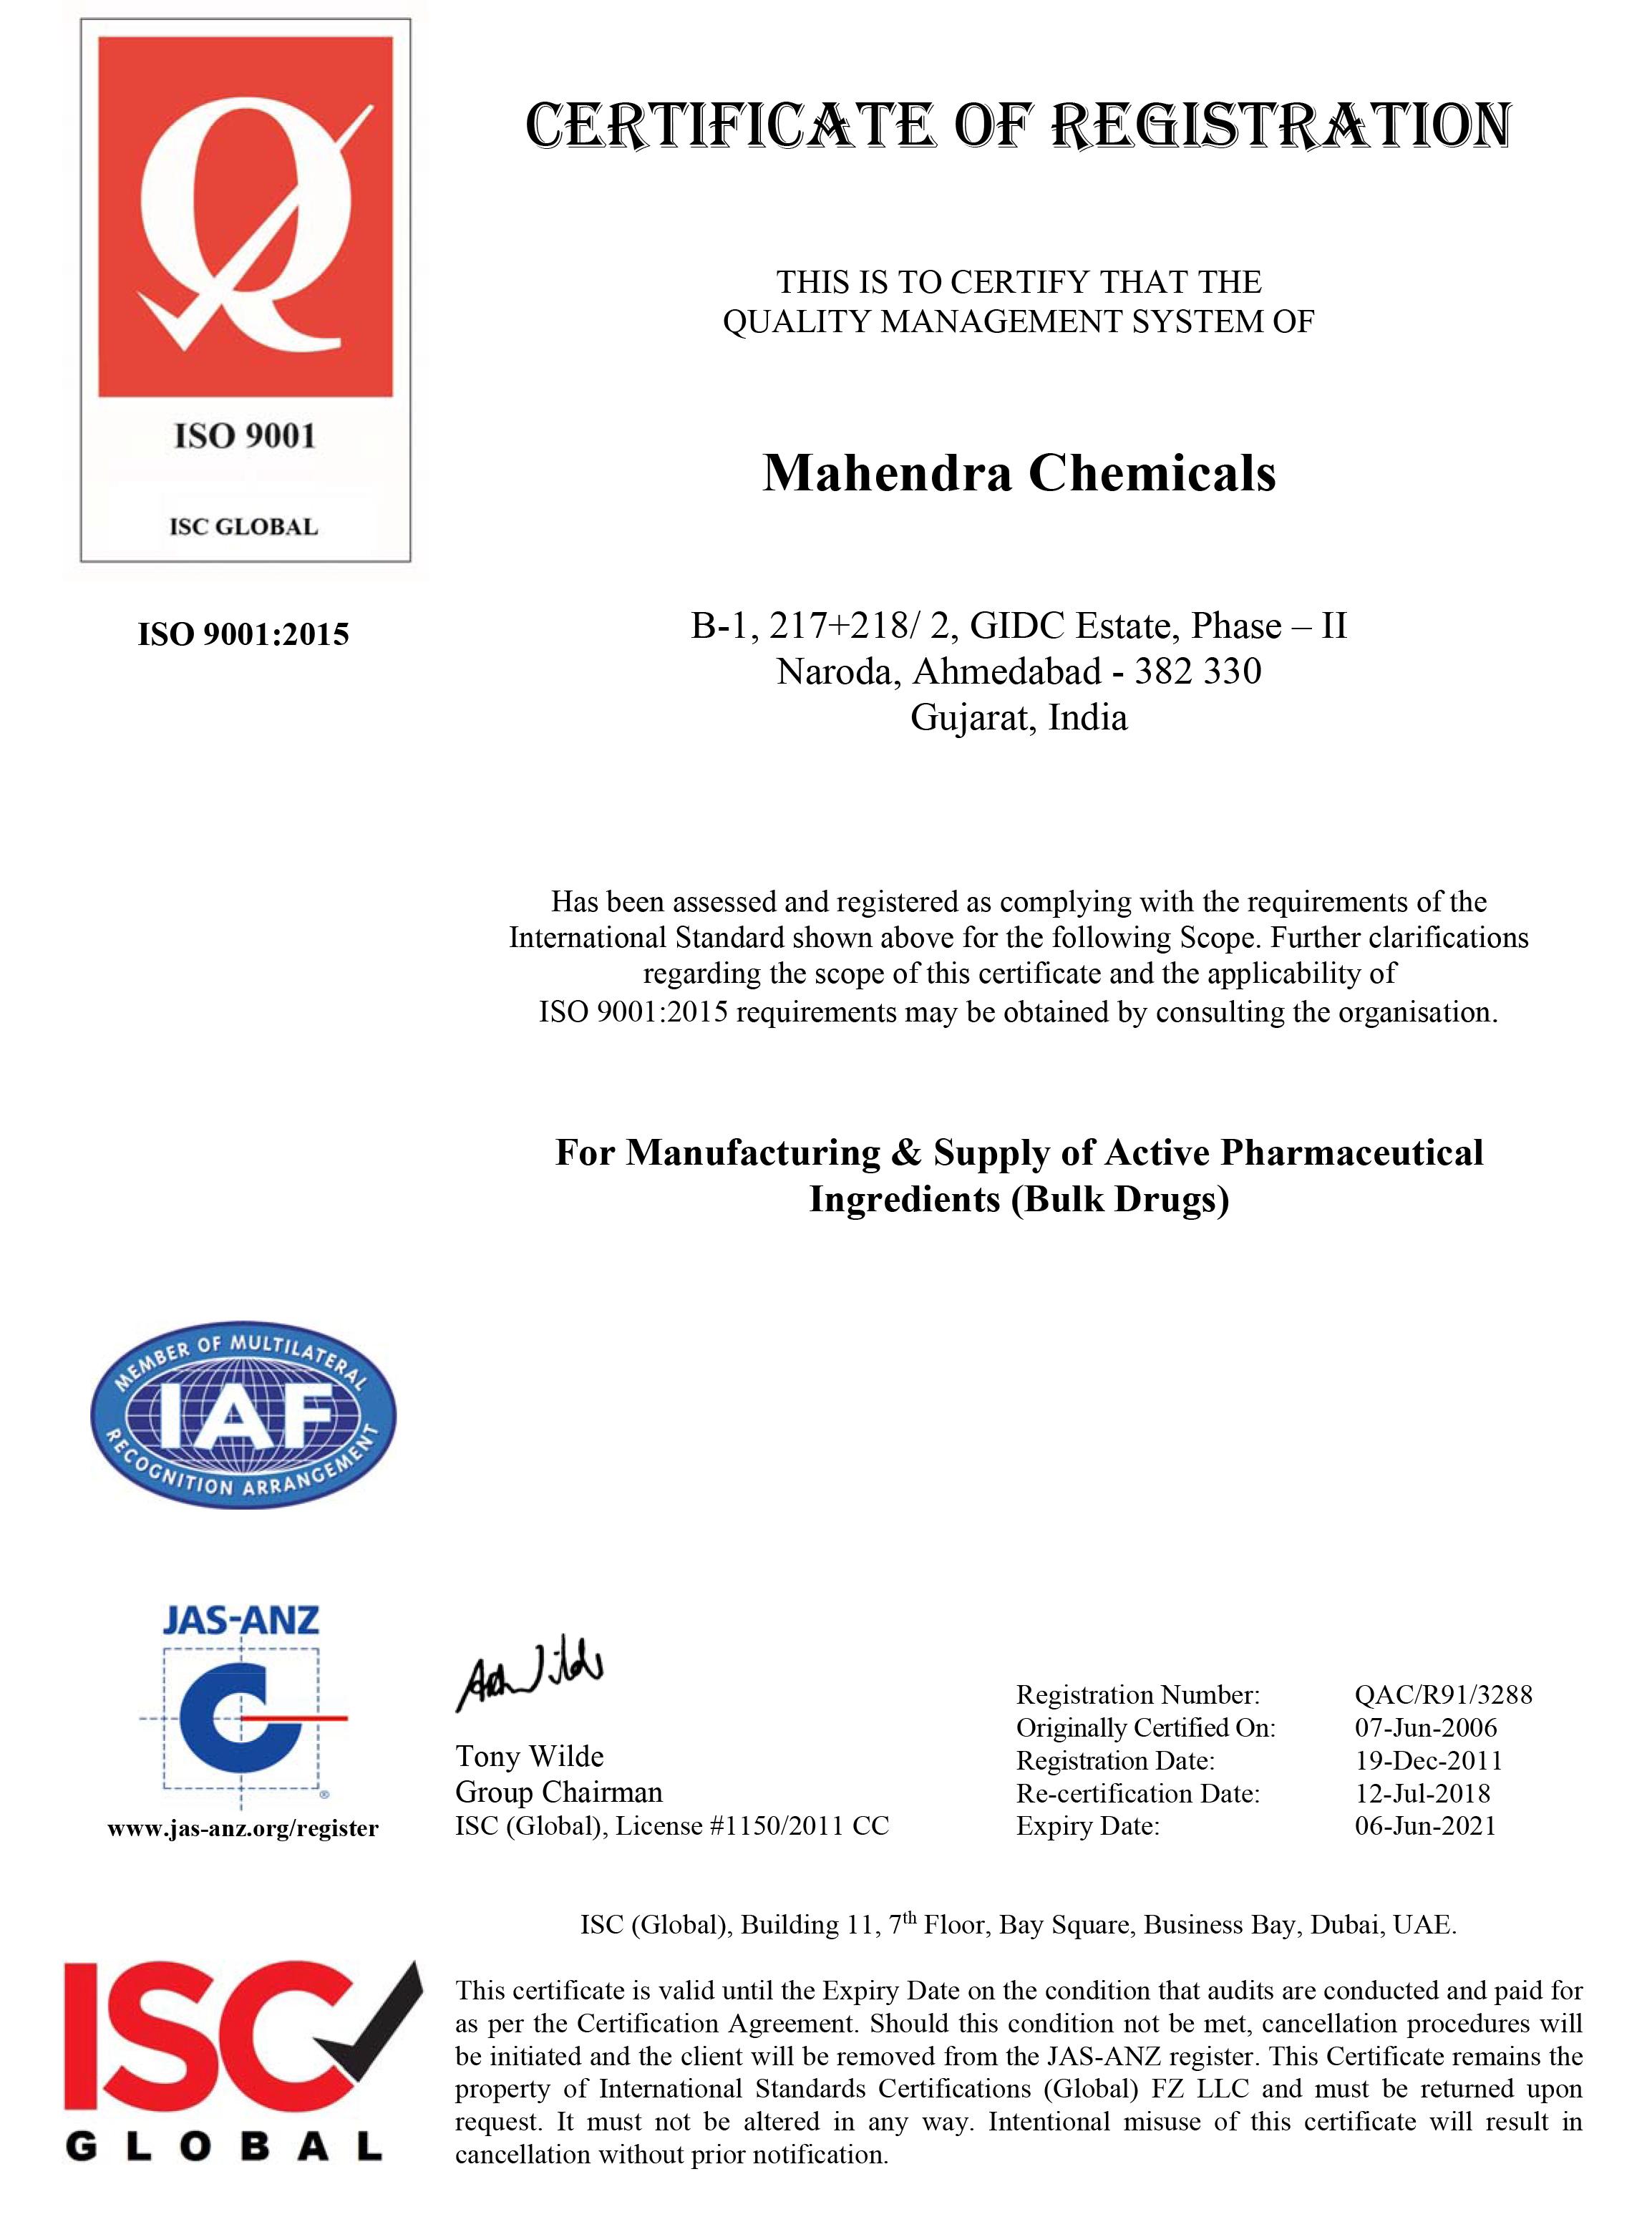 Microsoft Word – Mahendra Chemicals Triennial (QMS-2015).doc